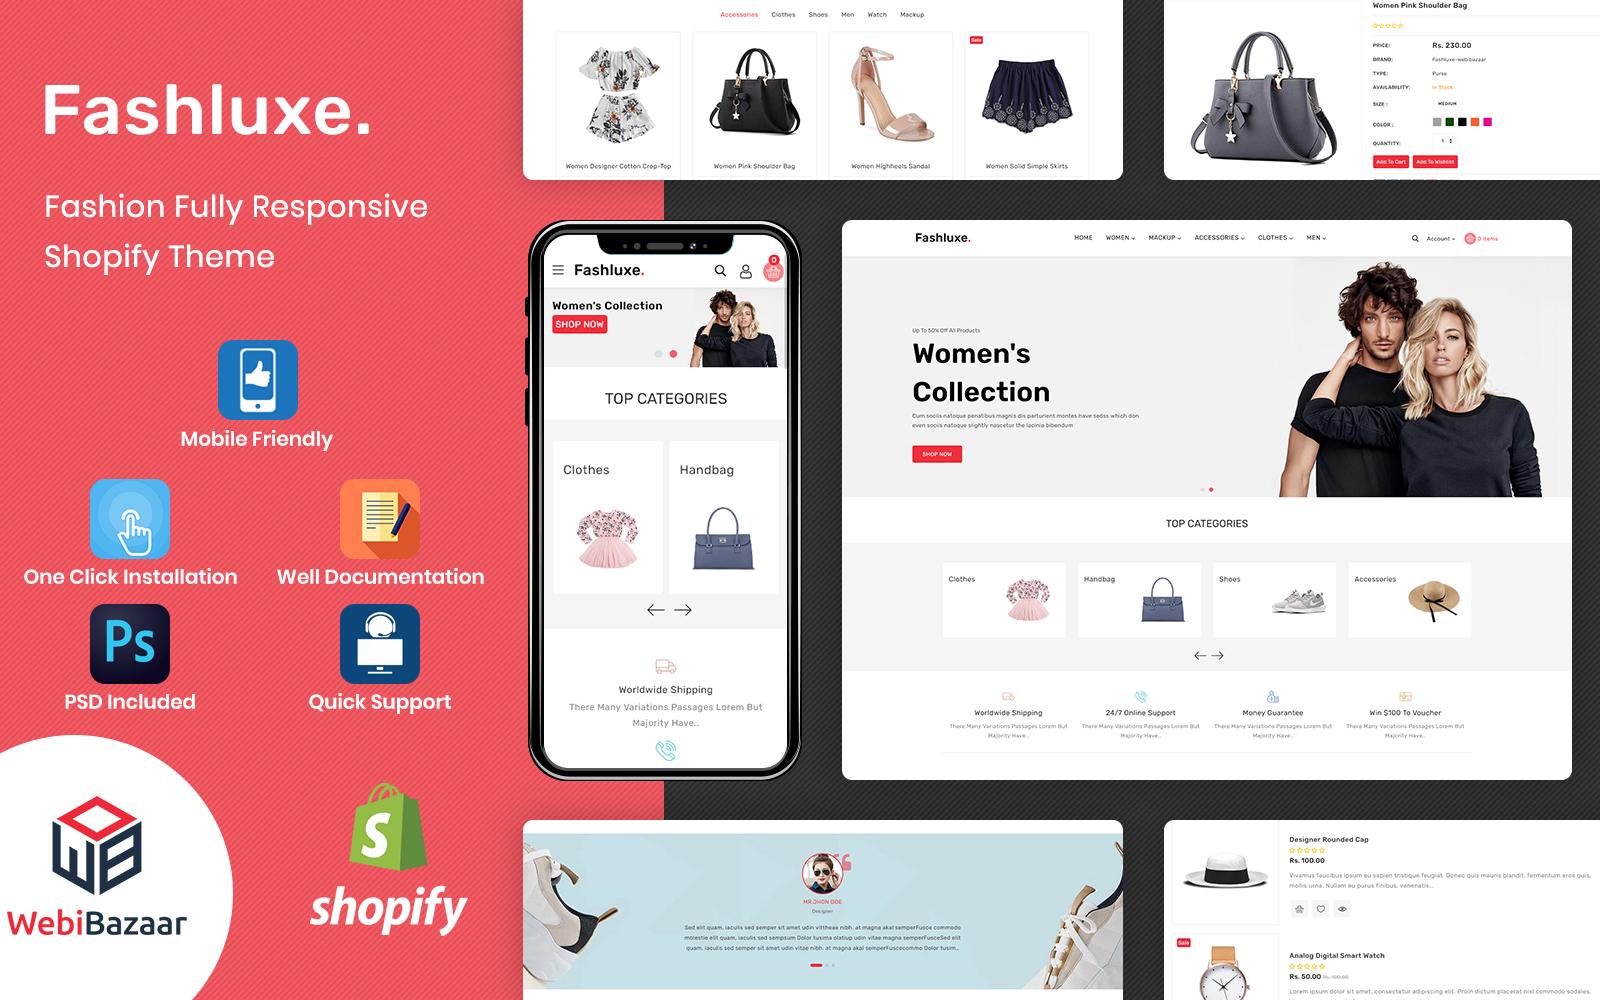 Fashluxe - Shopify-sjabloon voor moderne mode